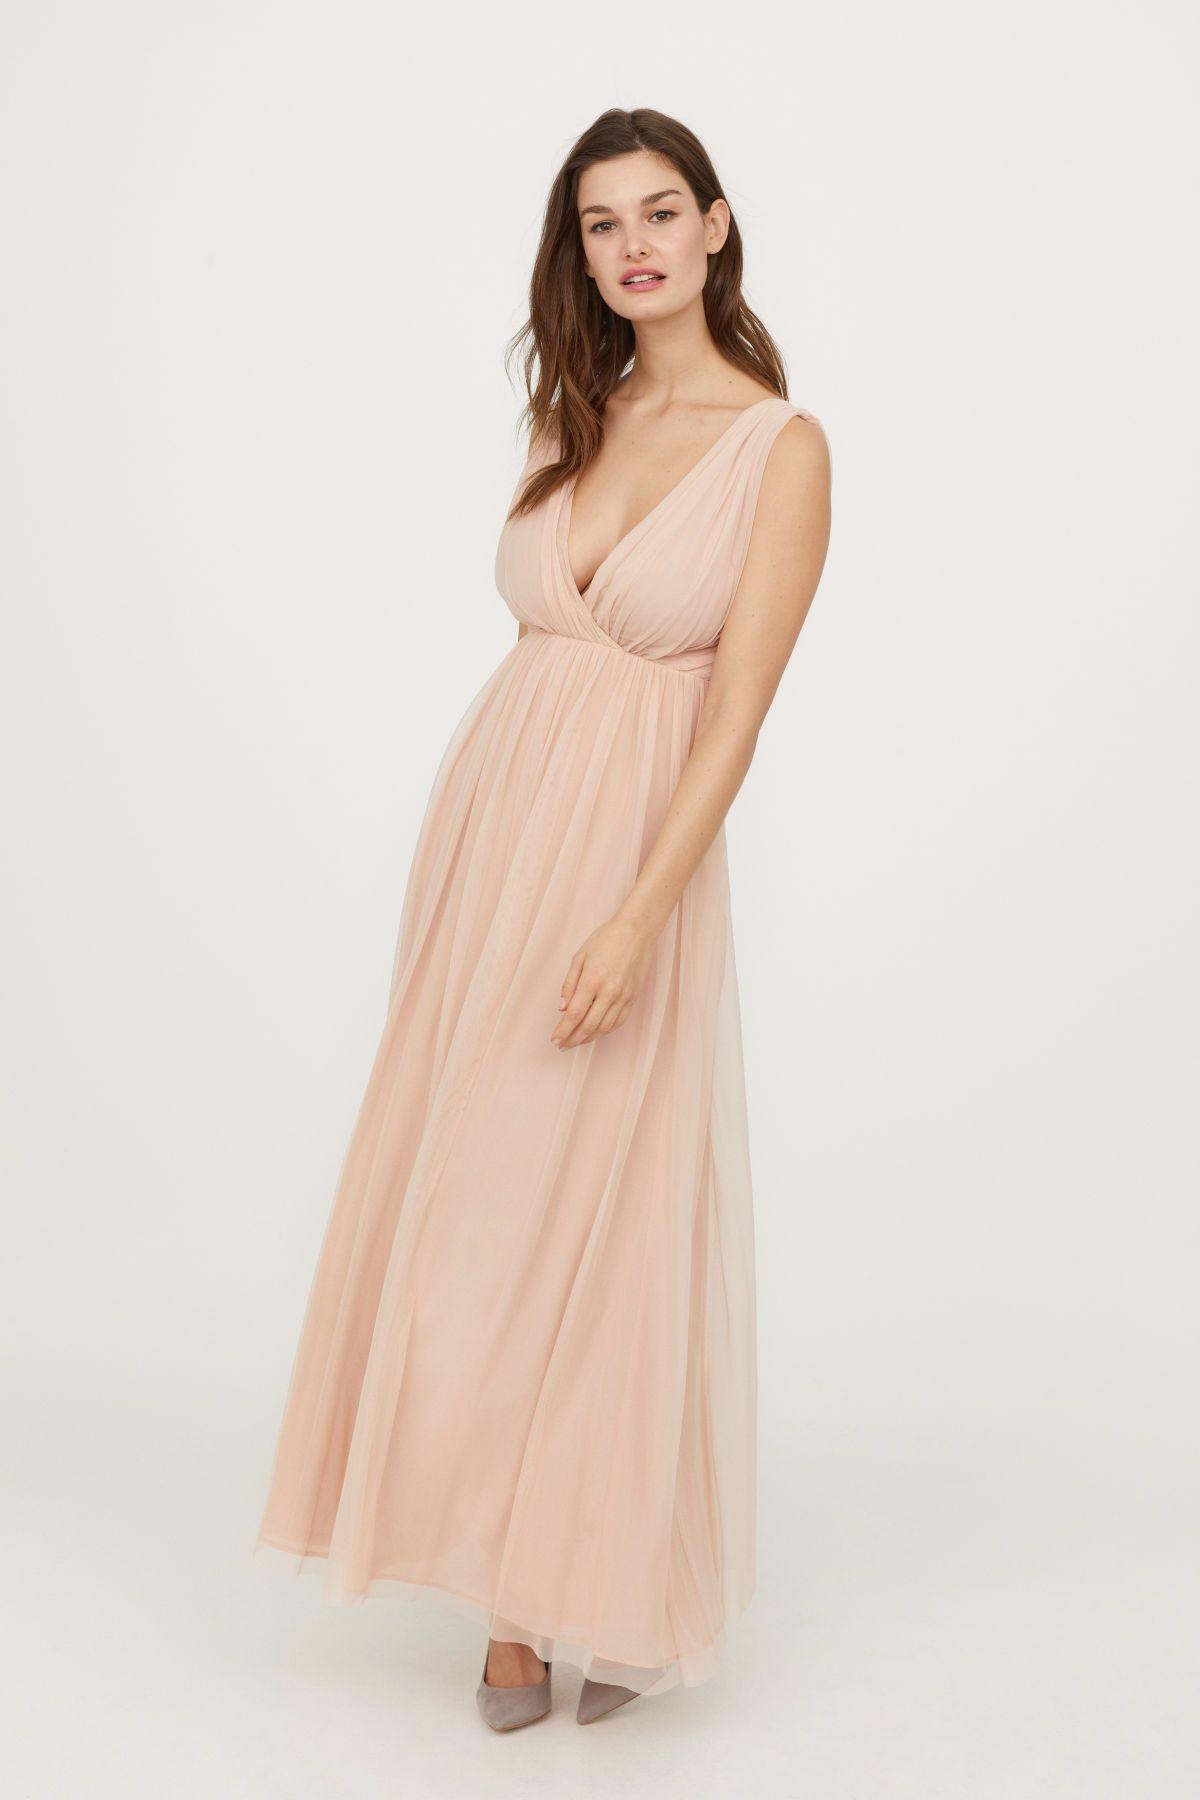 H&m dusty pink dress  Long Mesh Dress  Powder pink  WOMEN  HuM US  HuM  Pinterest